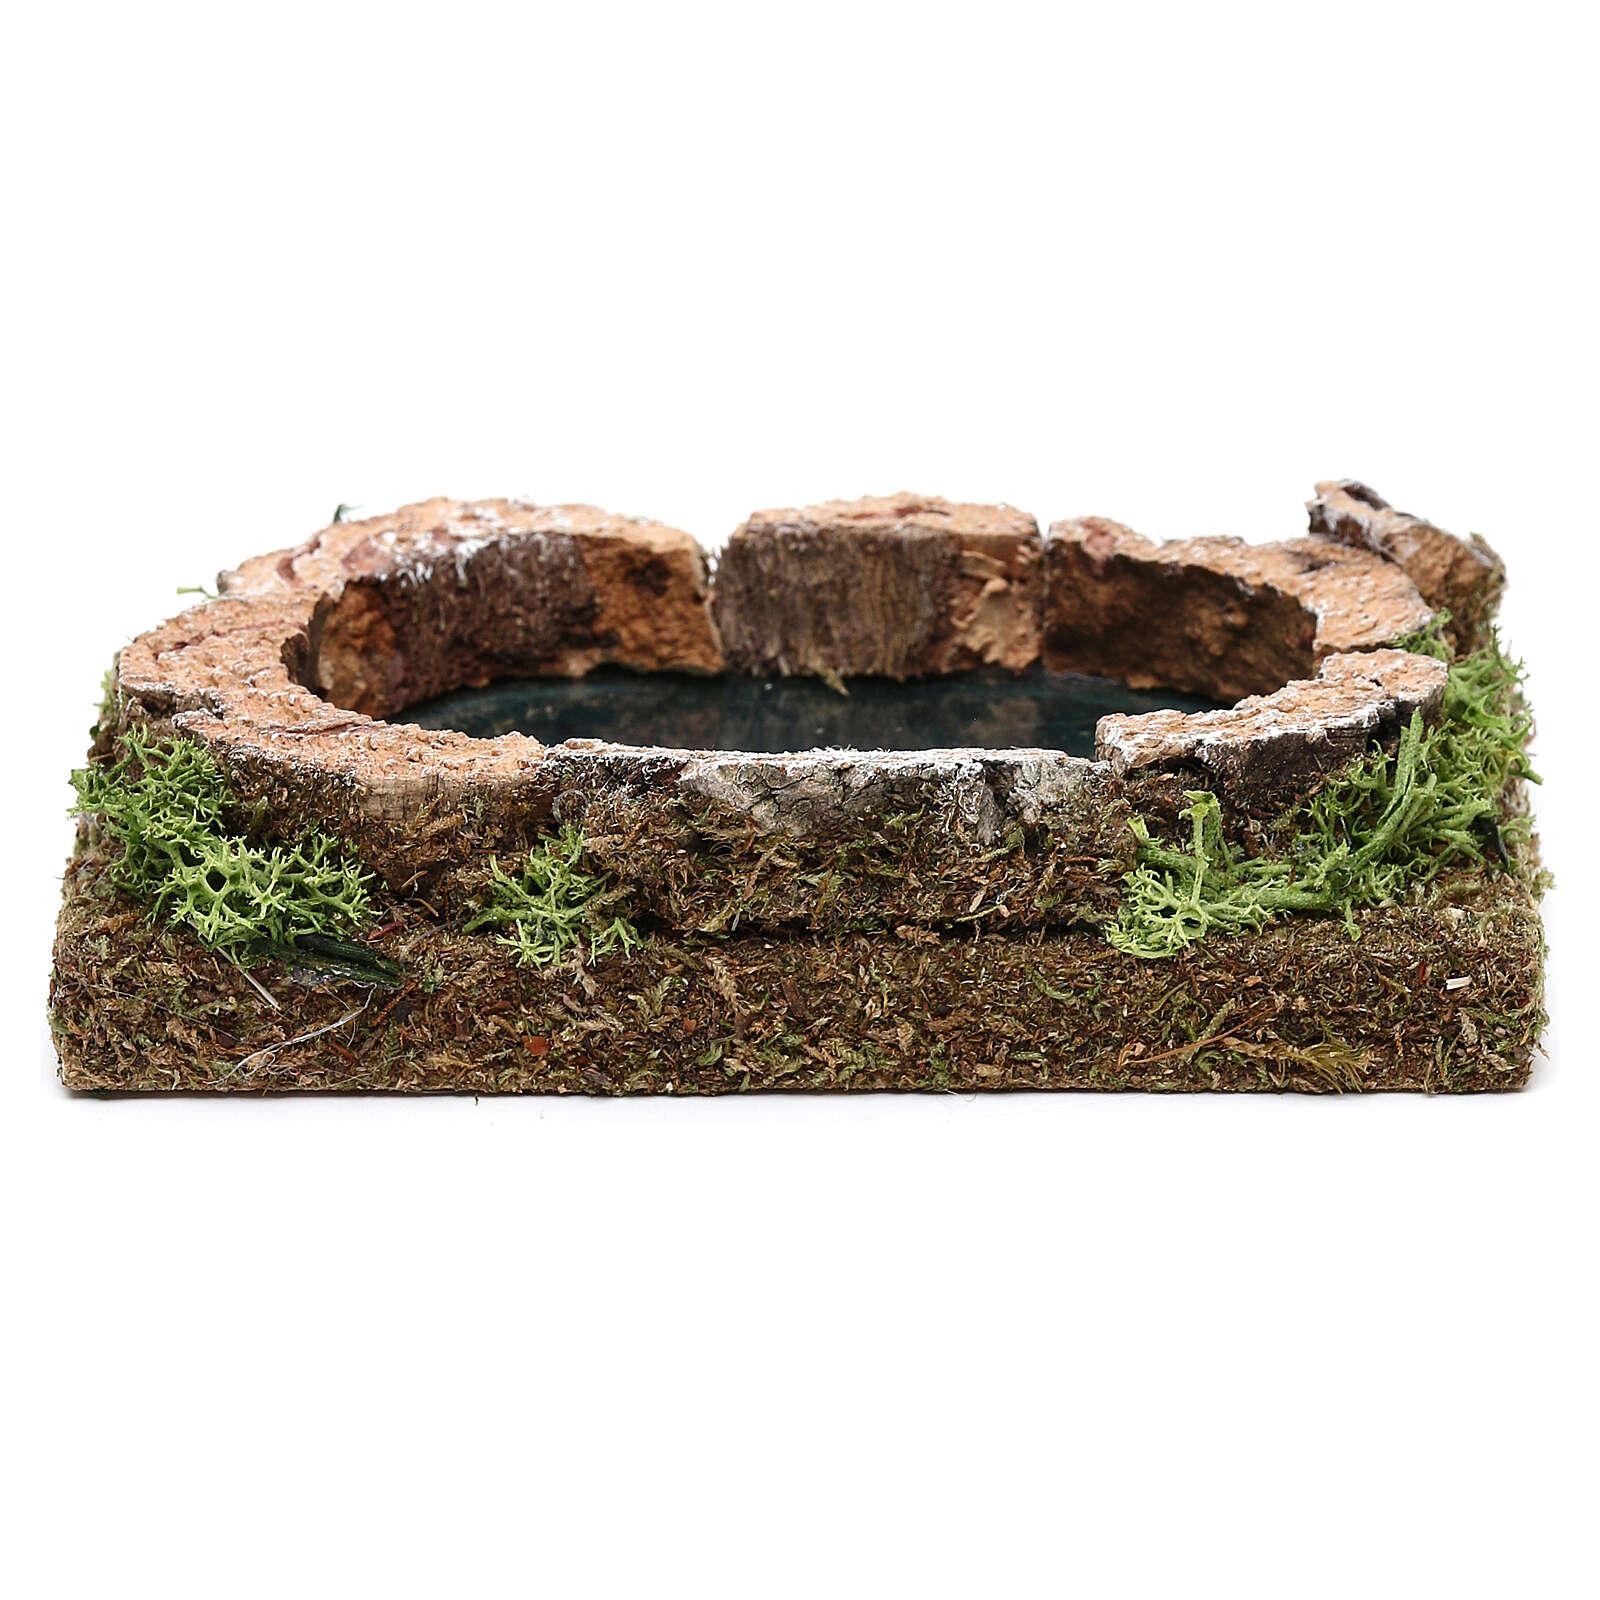 Miniature pond for nativity, in cork 3x15x10 cm 4